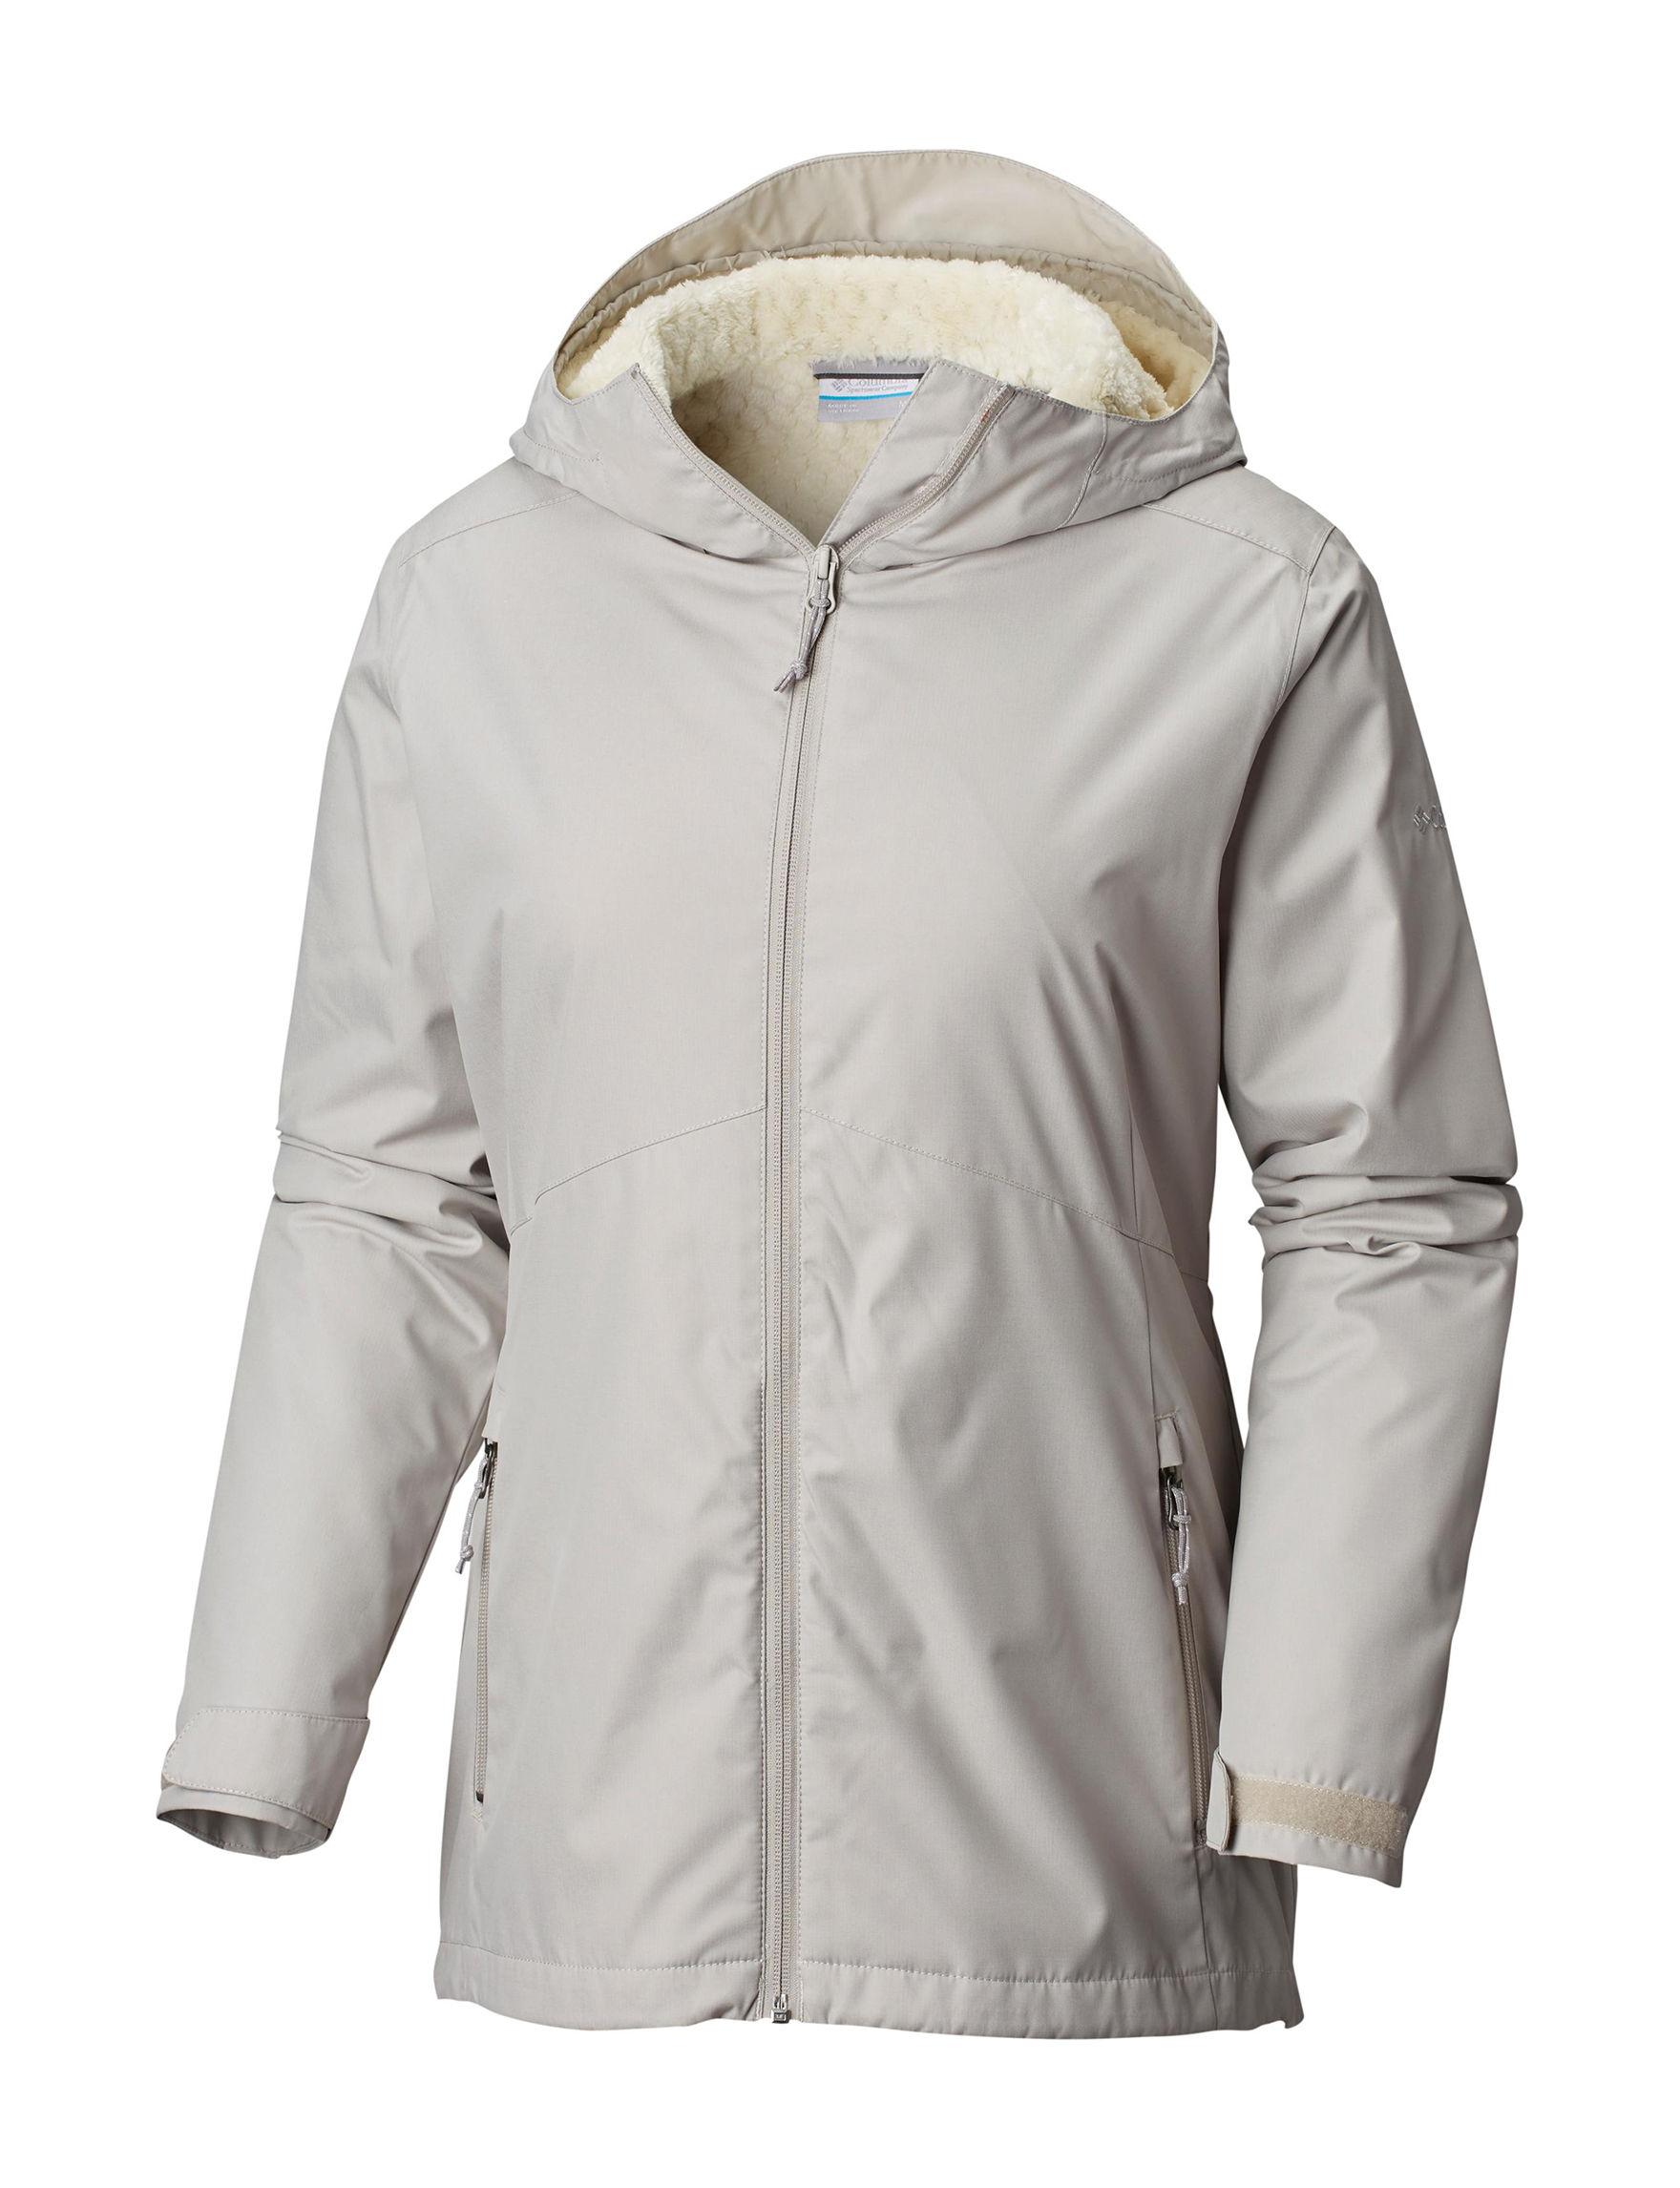 Columbia Grey Lightweight Jackets & Blazers Rain & Snow Jackets